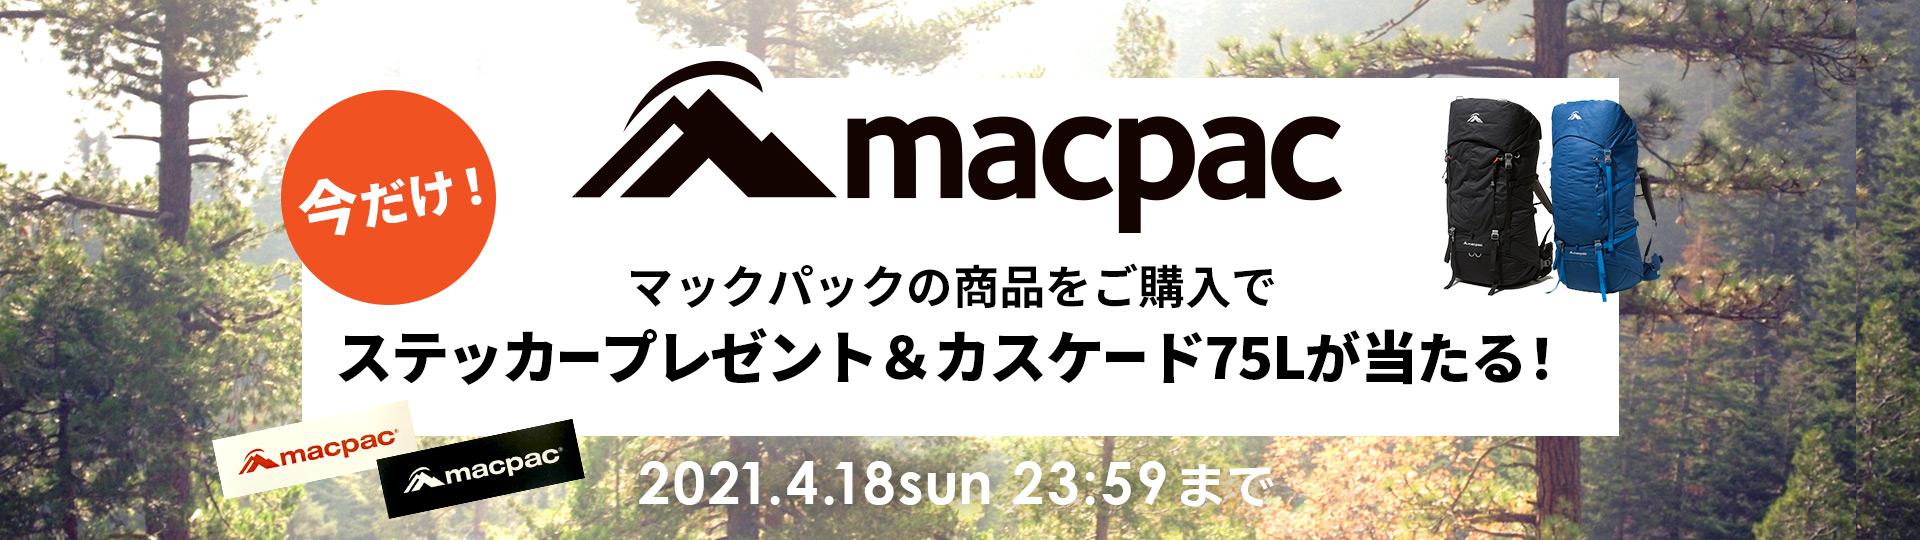 macpacキャンペーン